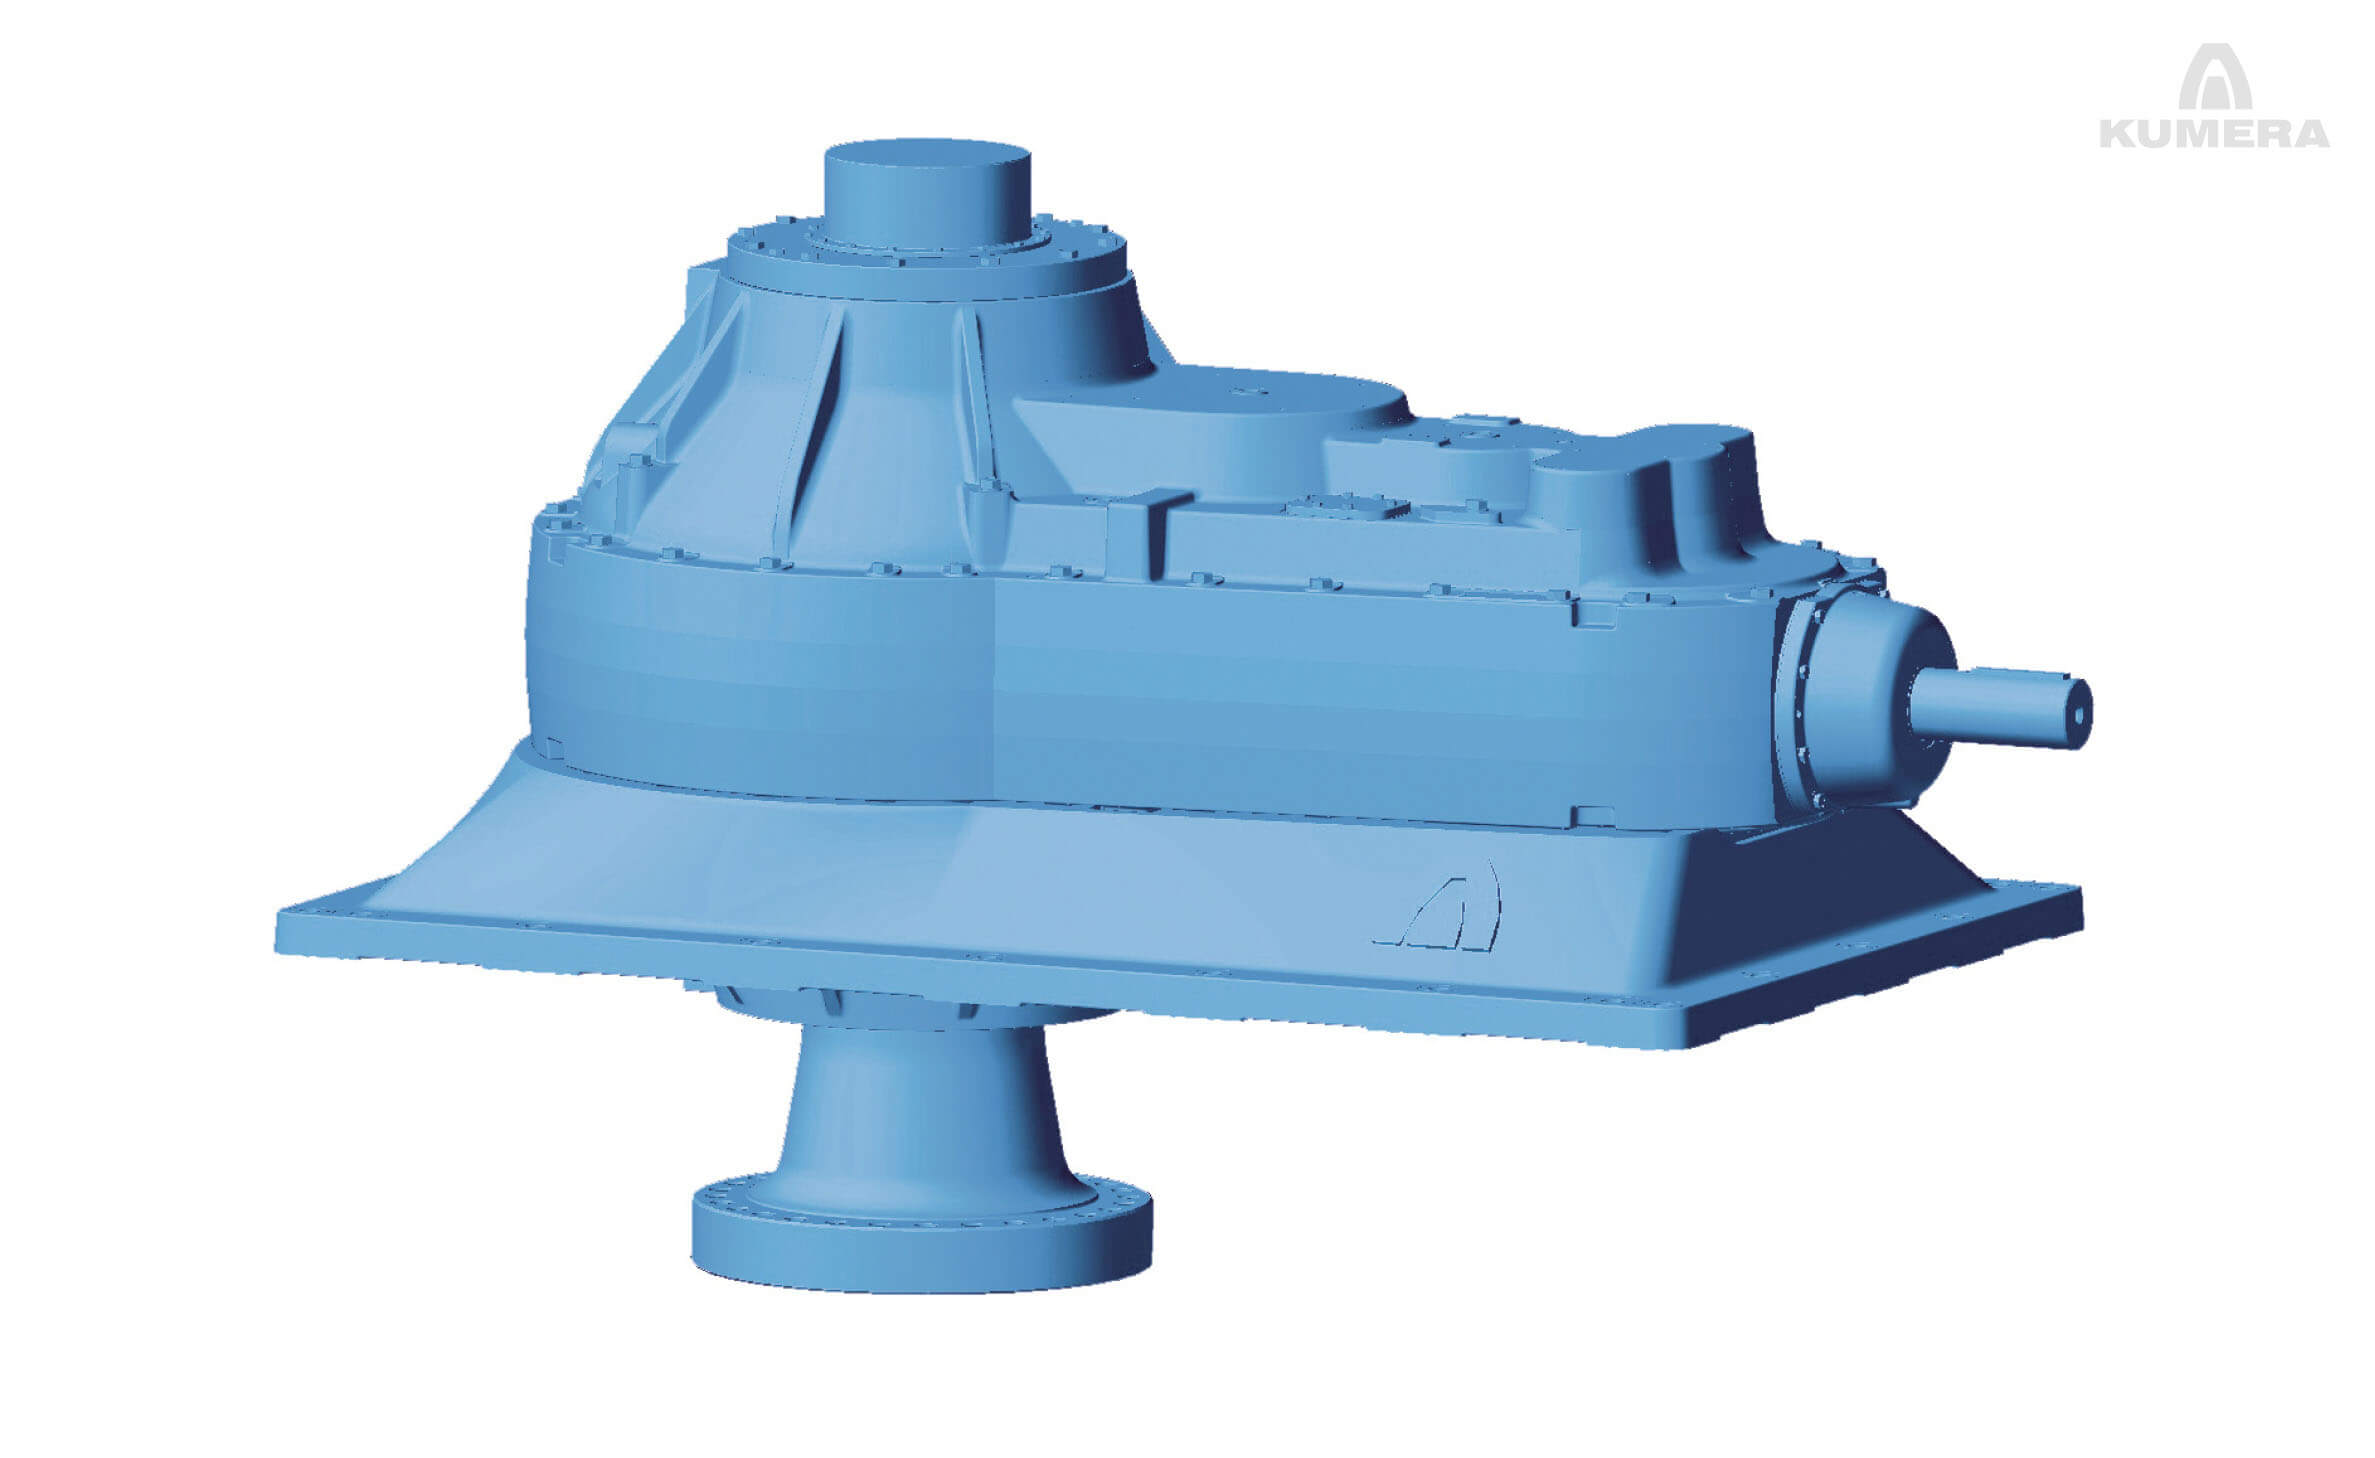 Kumera Agitator Gearboxes. Kumera SF-, SG-, E-Series - High External Loads Gearbox Range